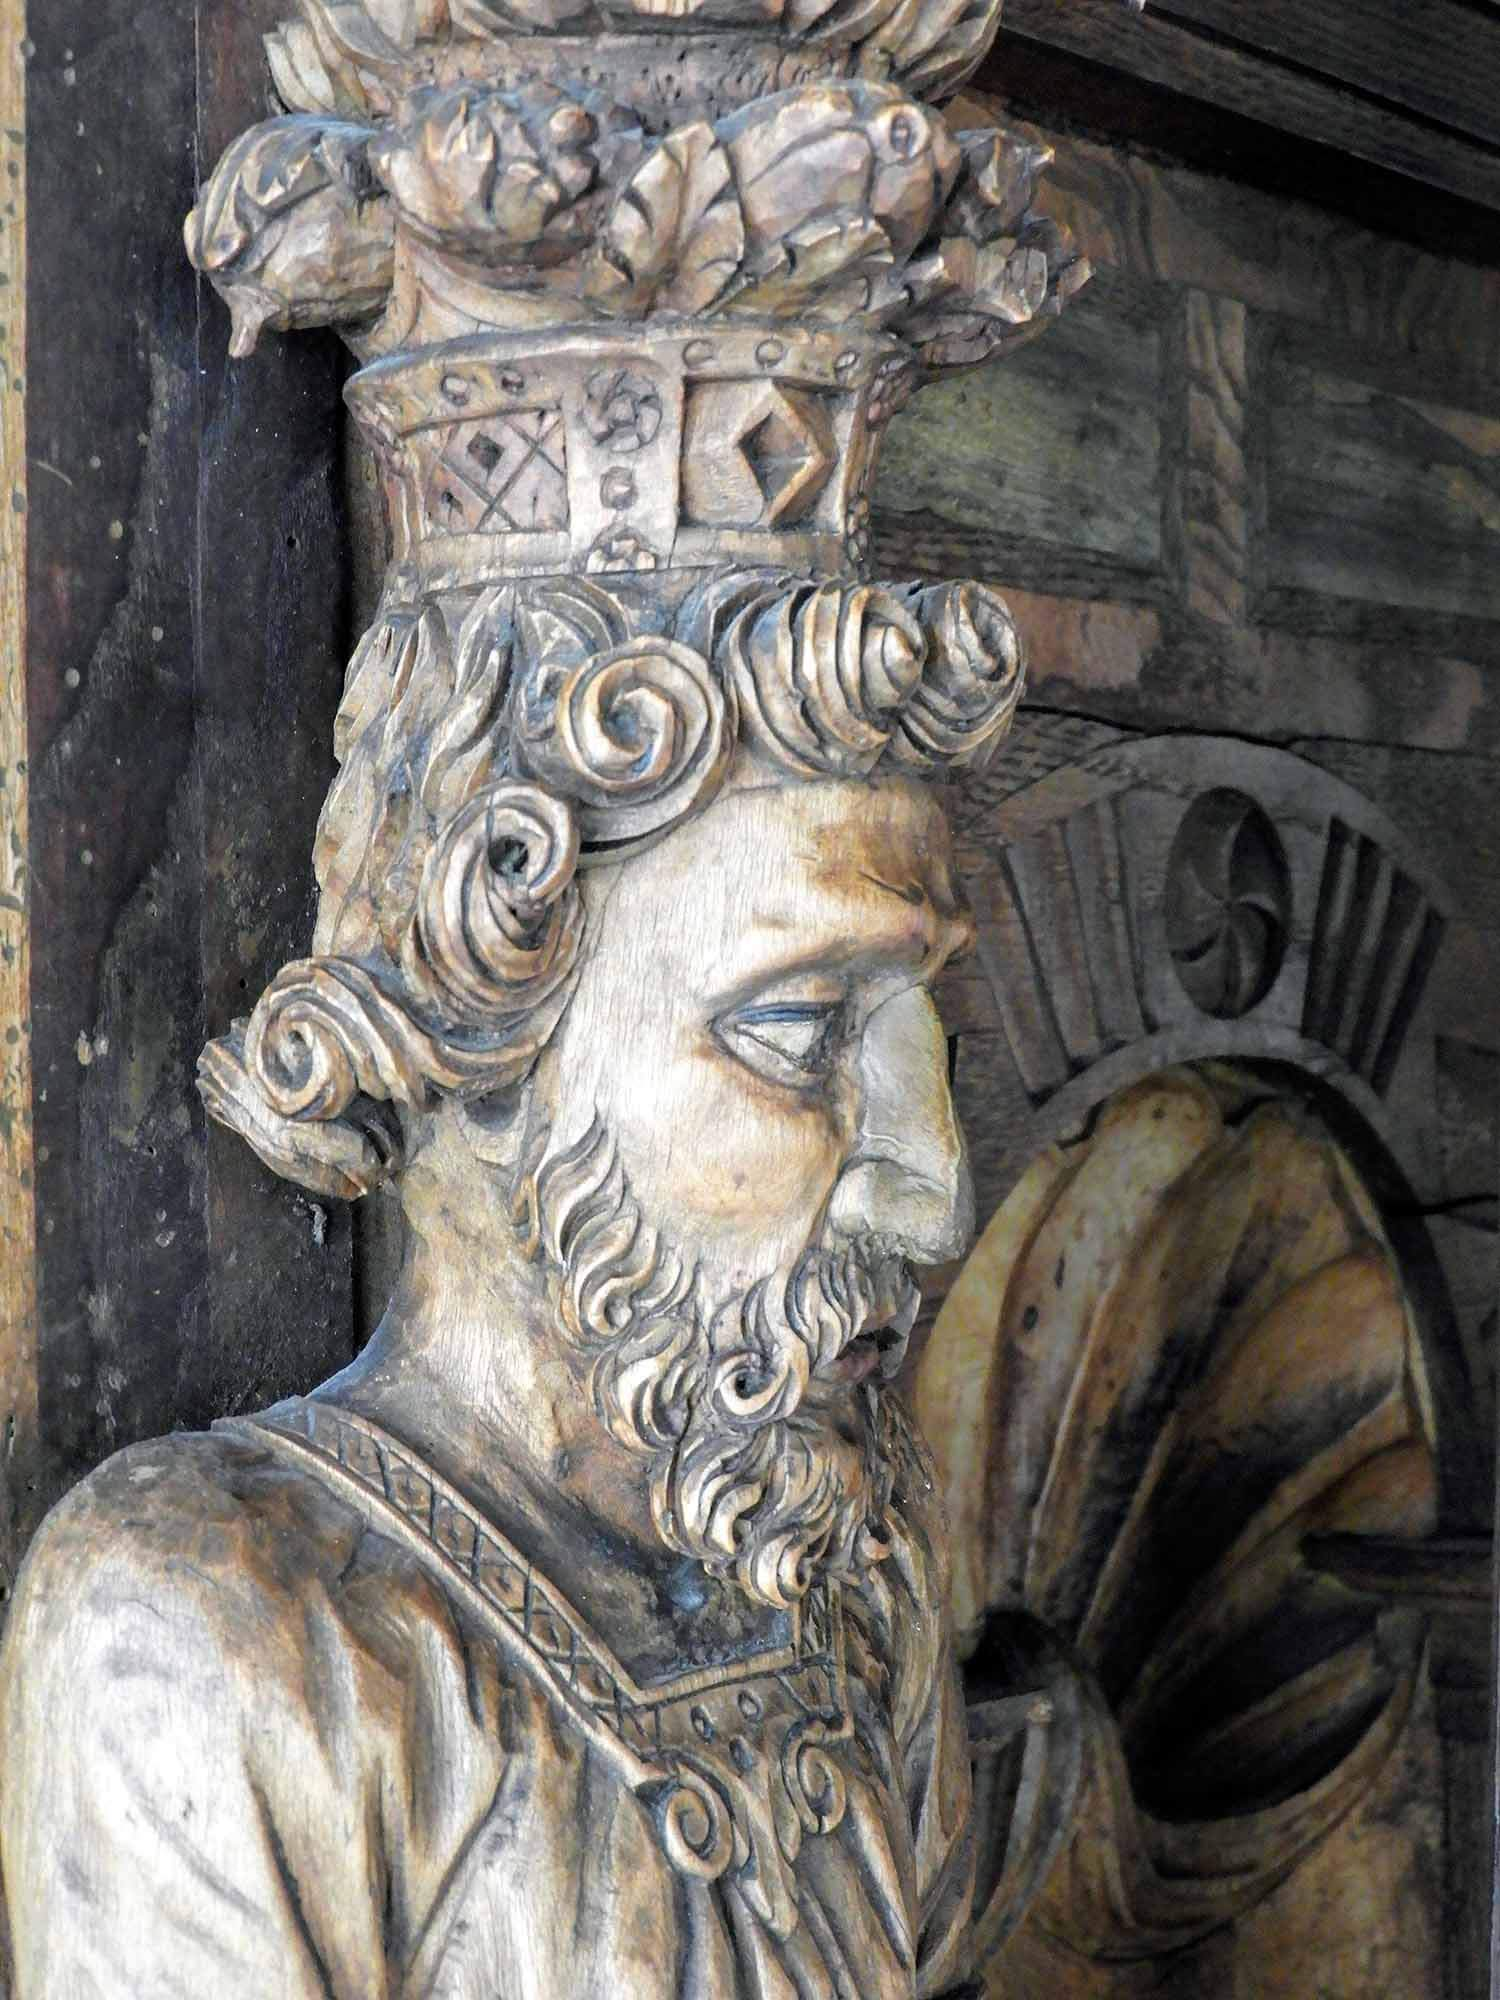 germany-kloster-ochsenhausen-wood-figurine.jpg